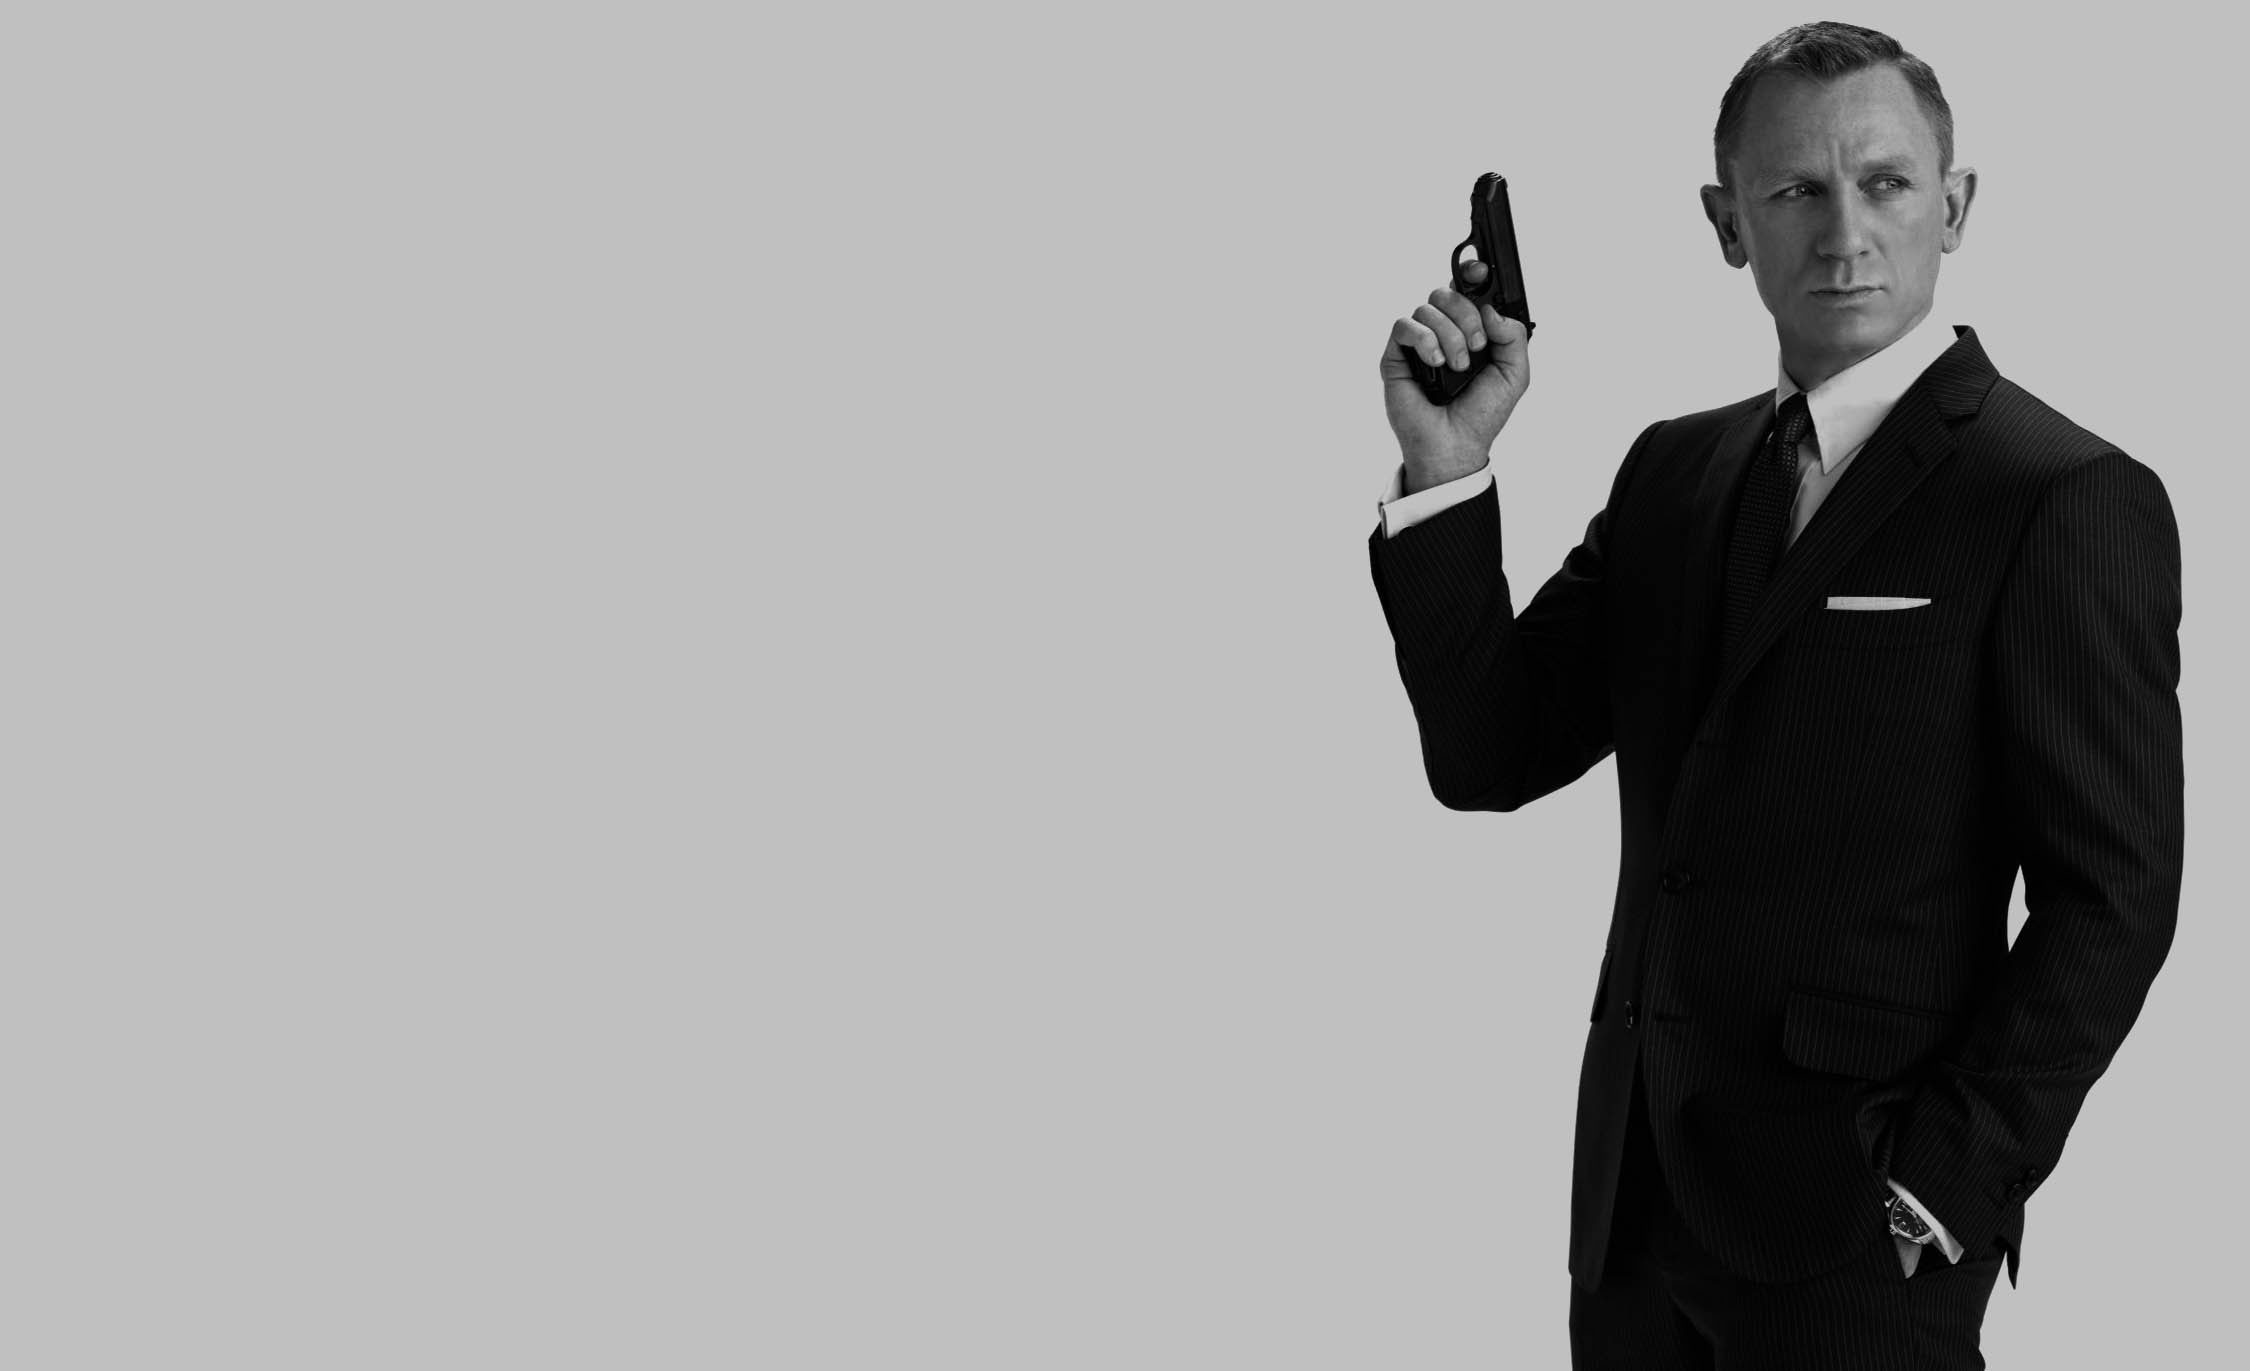 007 wallpaper iphone 74 images - James bond wallpaper iphone 5 ...